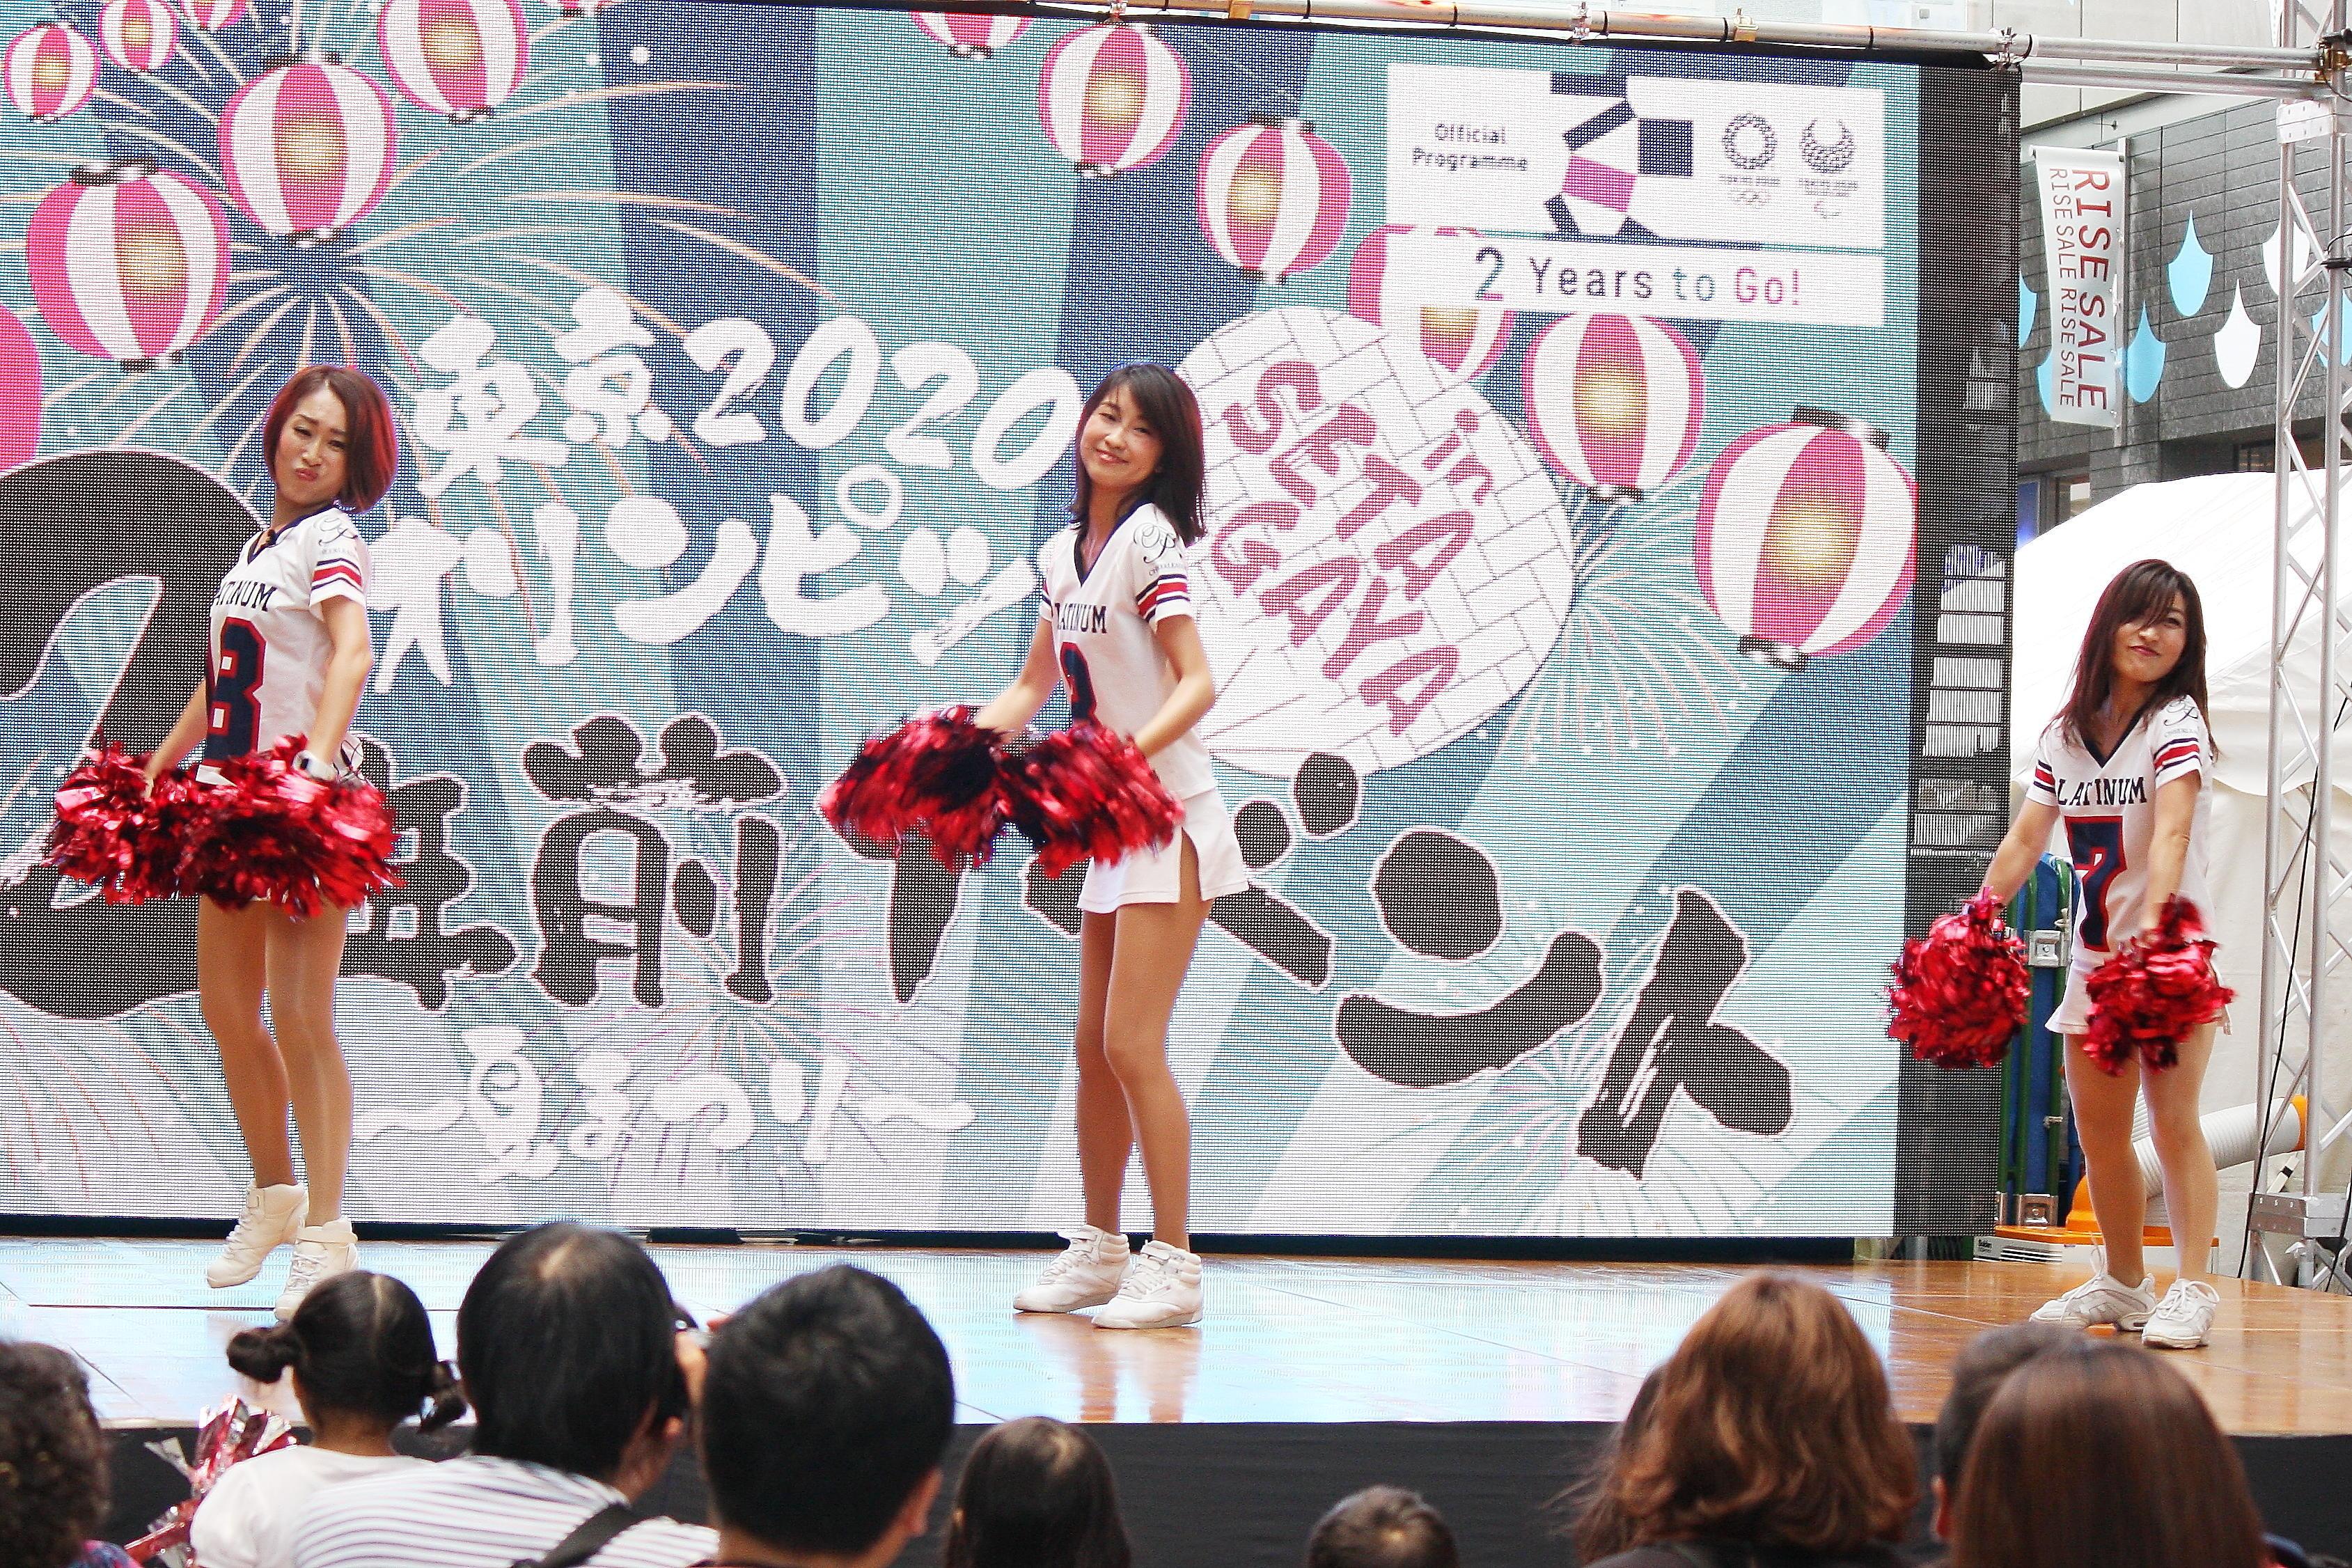 http://news.yoshimoto.co.jp/20180730144603-26055cd0b69a9b8d44c18ab7fd786fab7756eddb.jpg